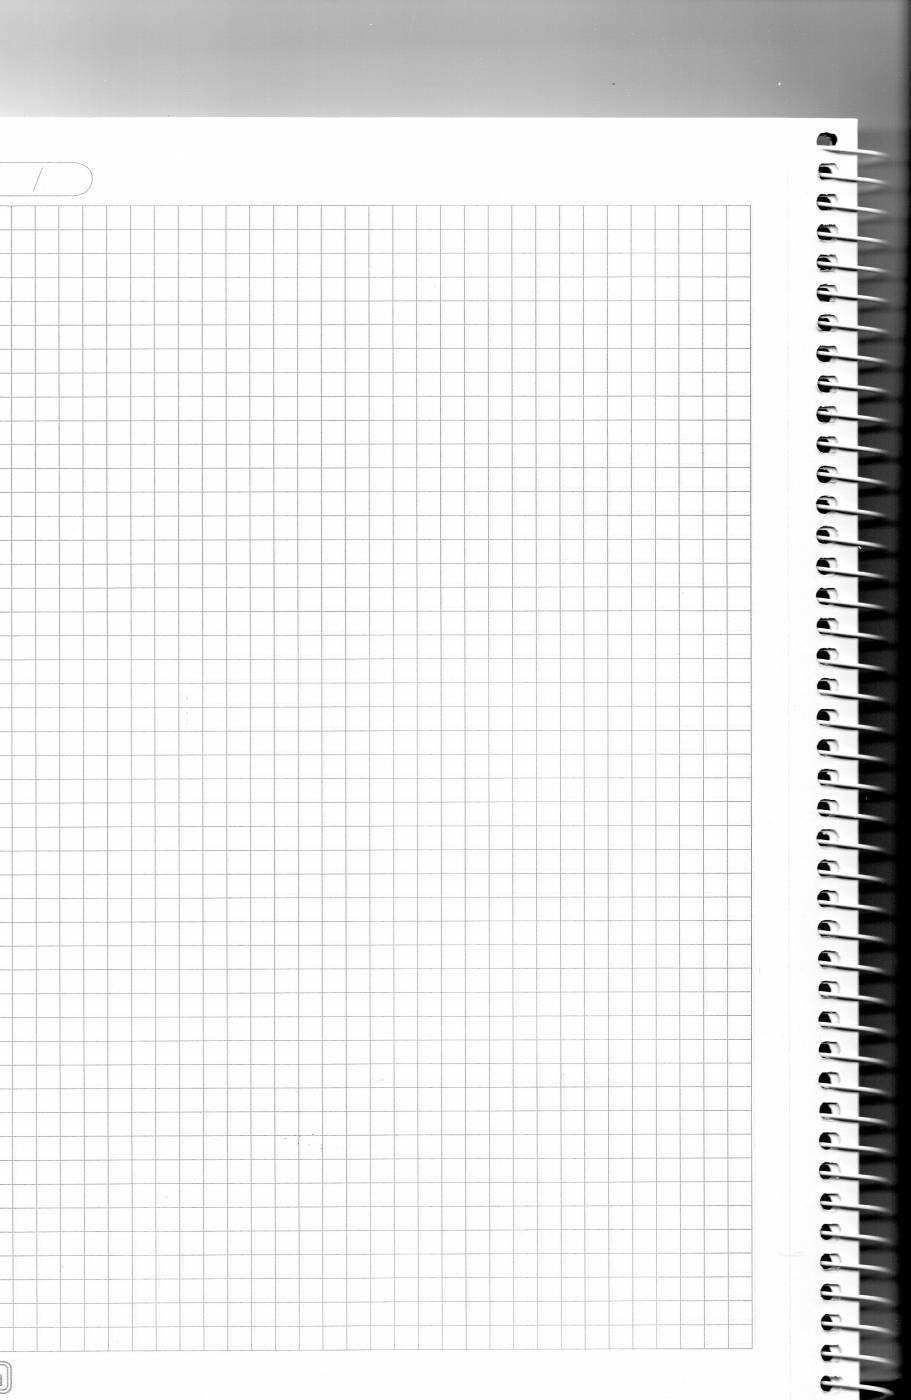 Caderno Lunix Tilibra Quadriculado 5 mm x 5 mm Lílas